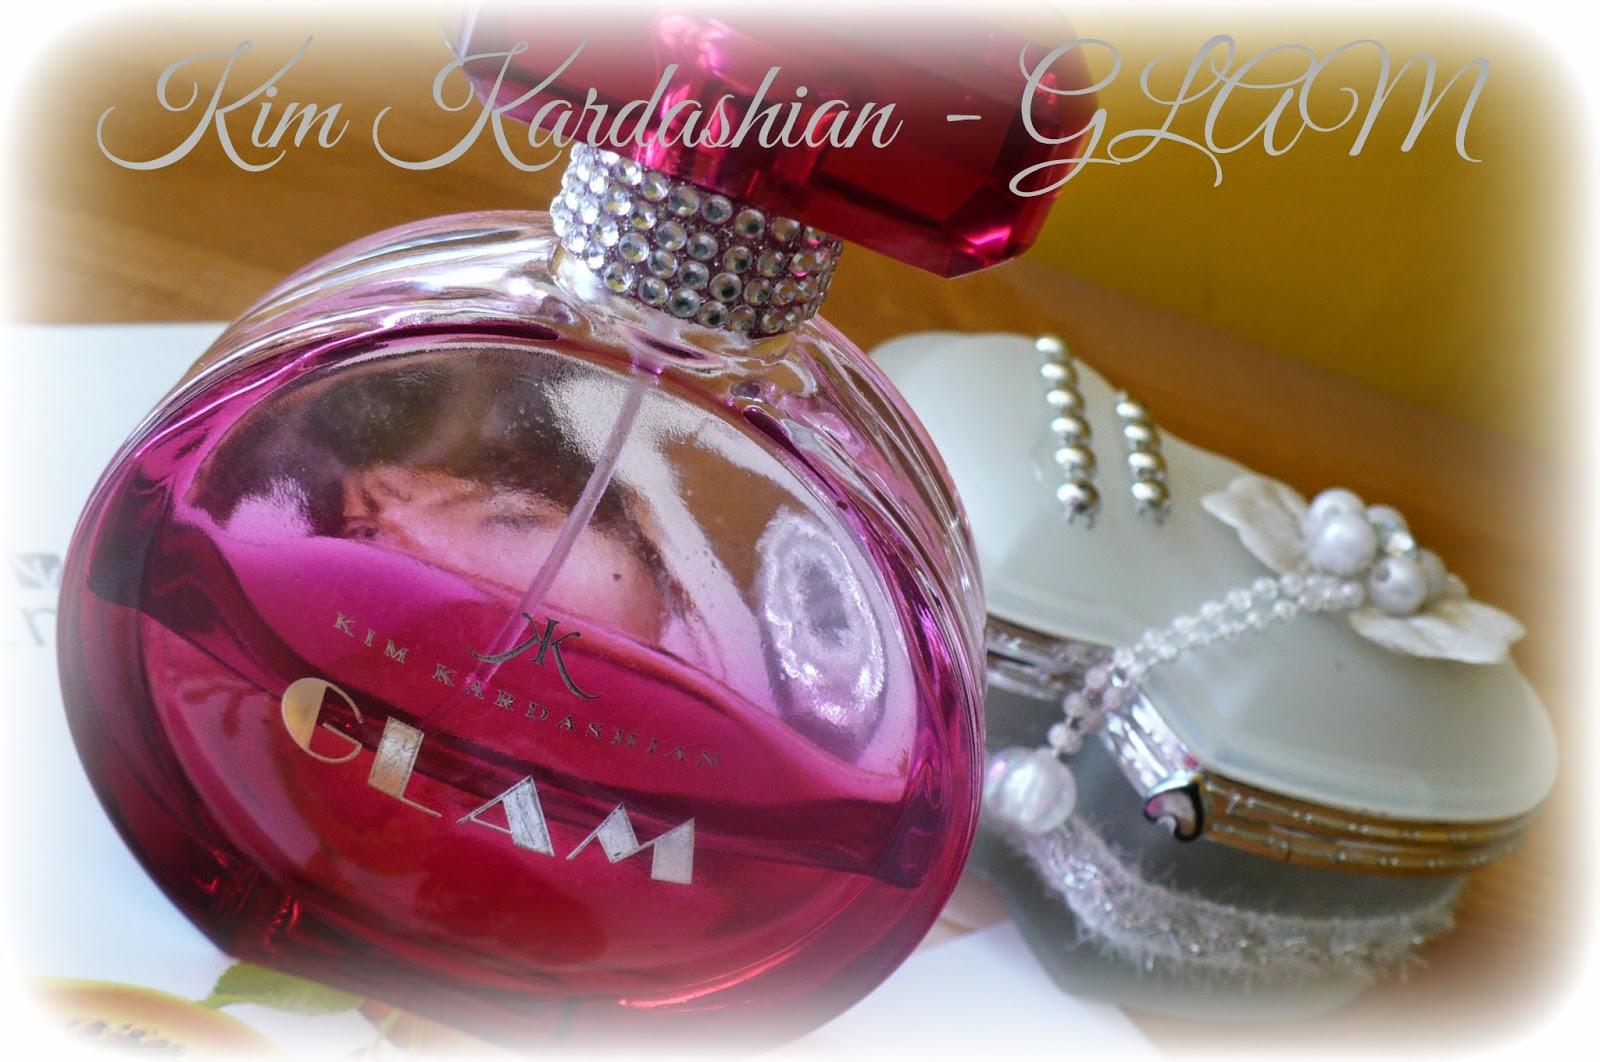 Kim Kardashian - Glam :)